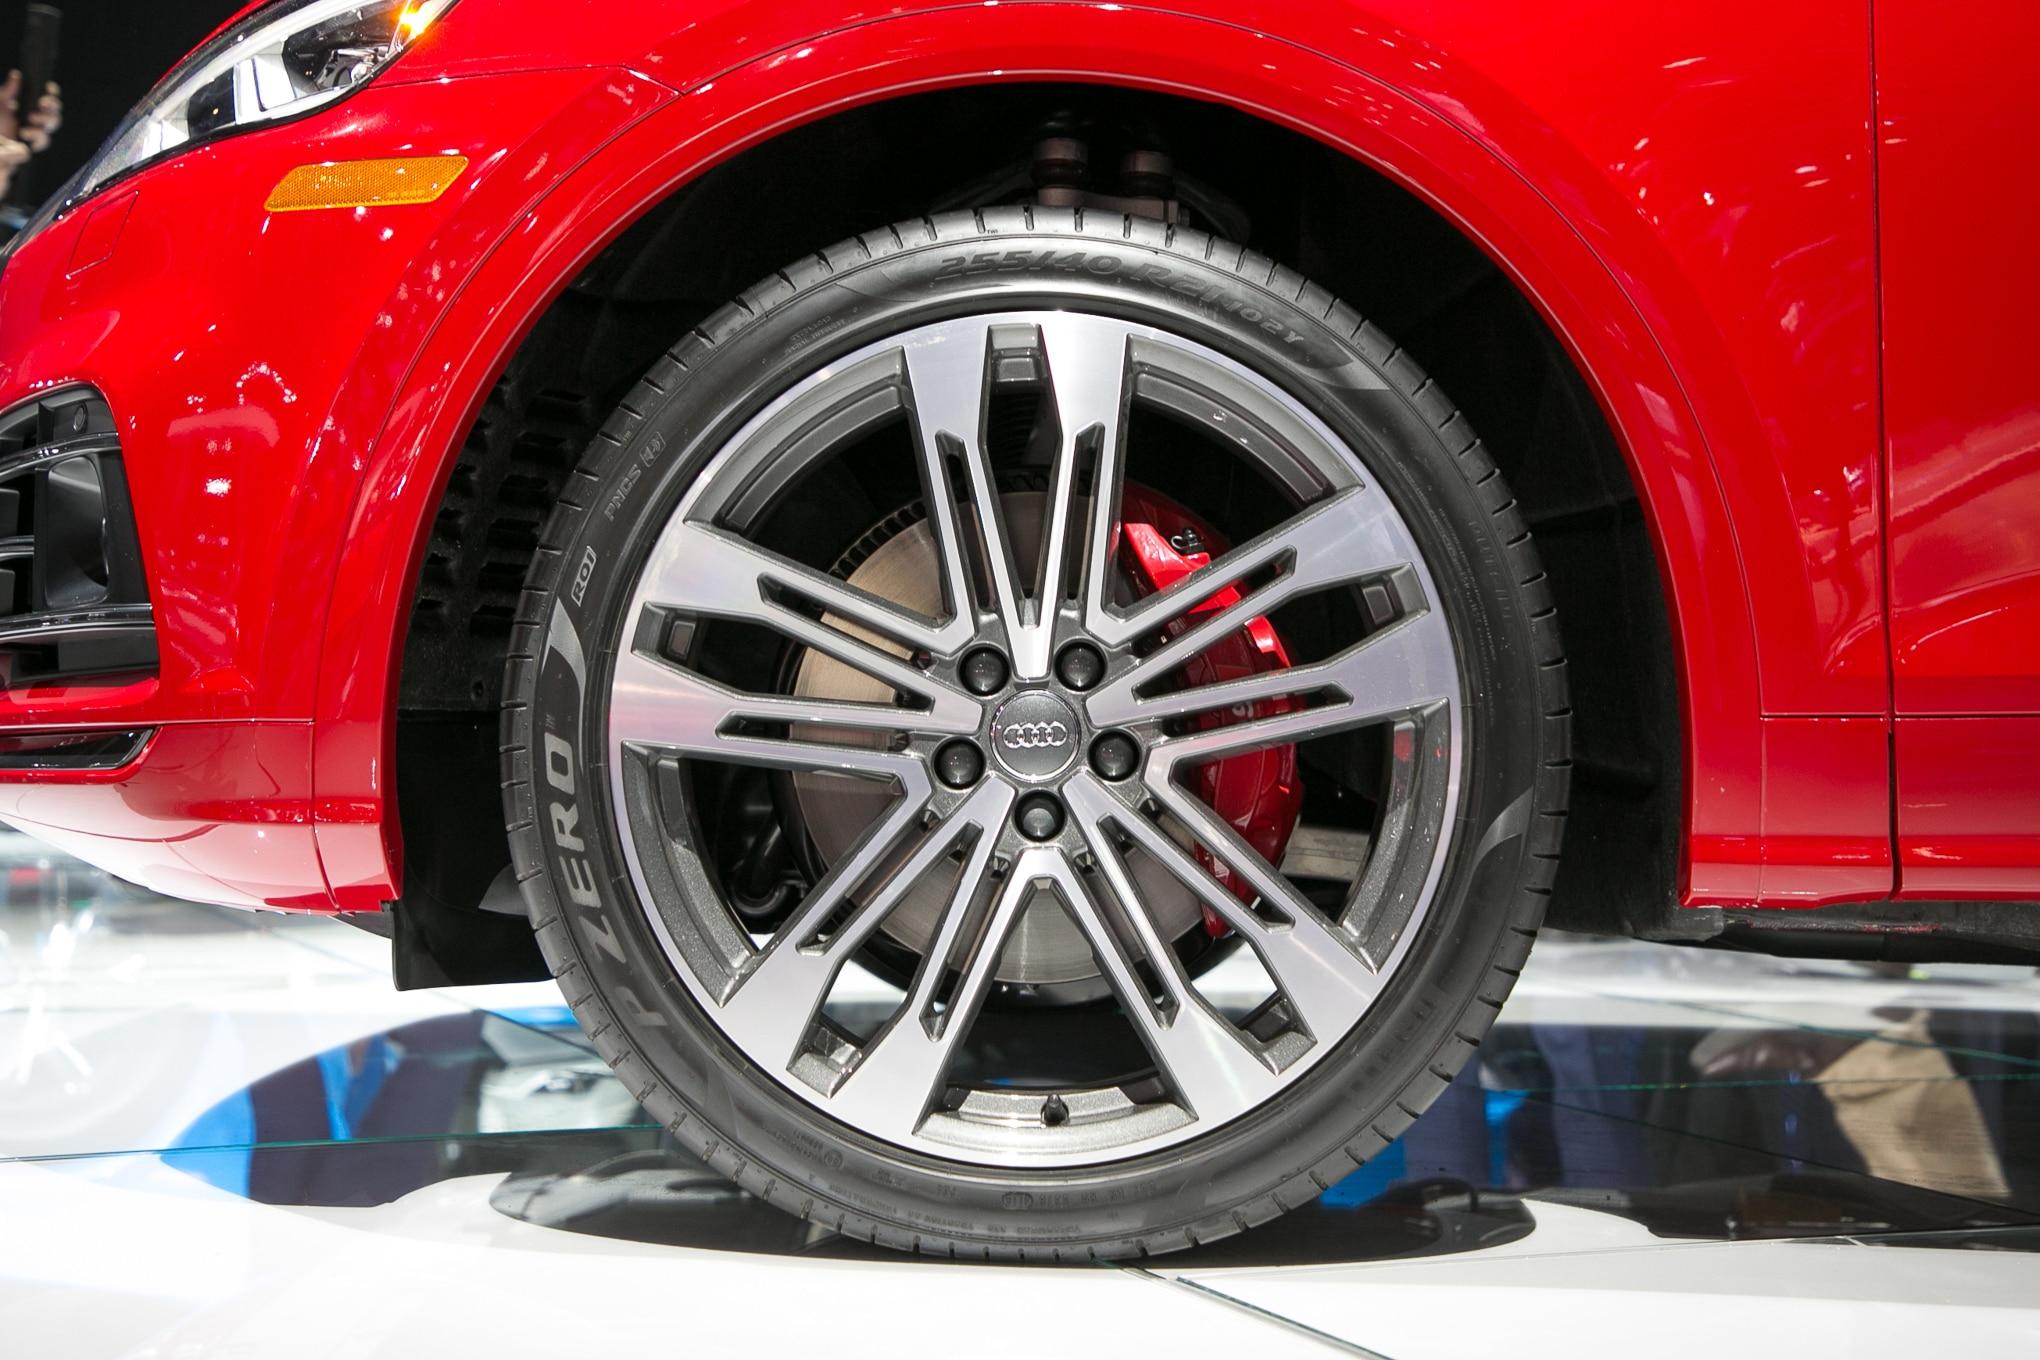 2018 audi wheels. interesting audi consistent  on 2018 audi wheels